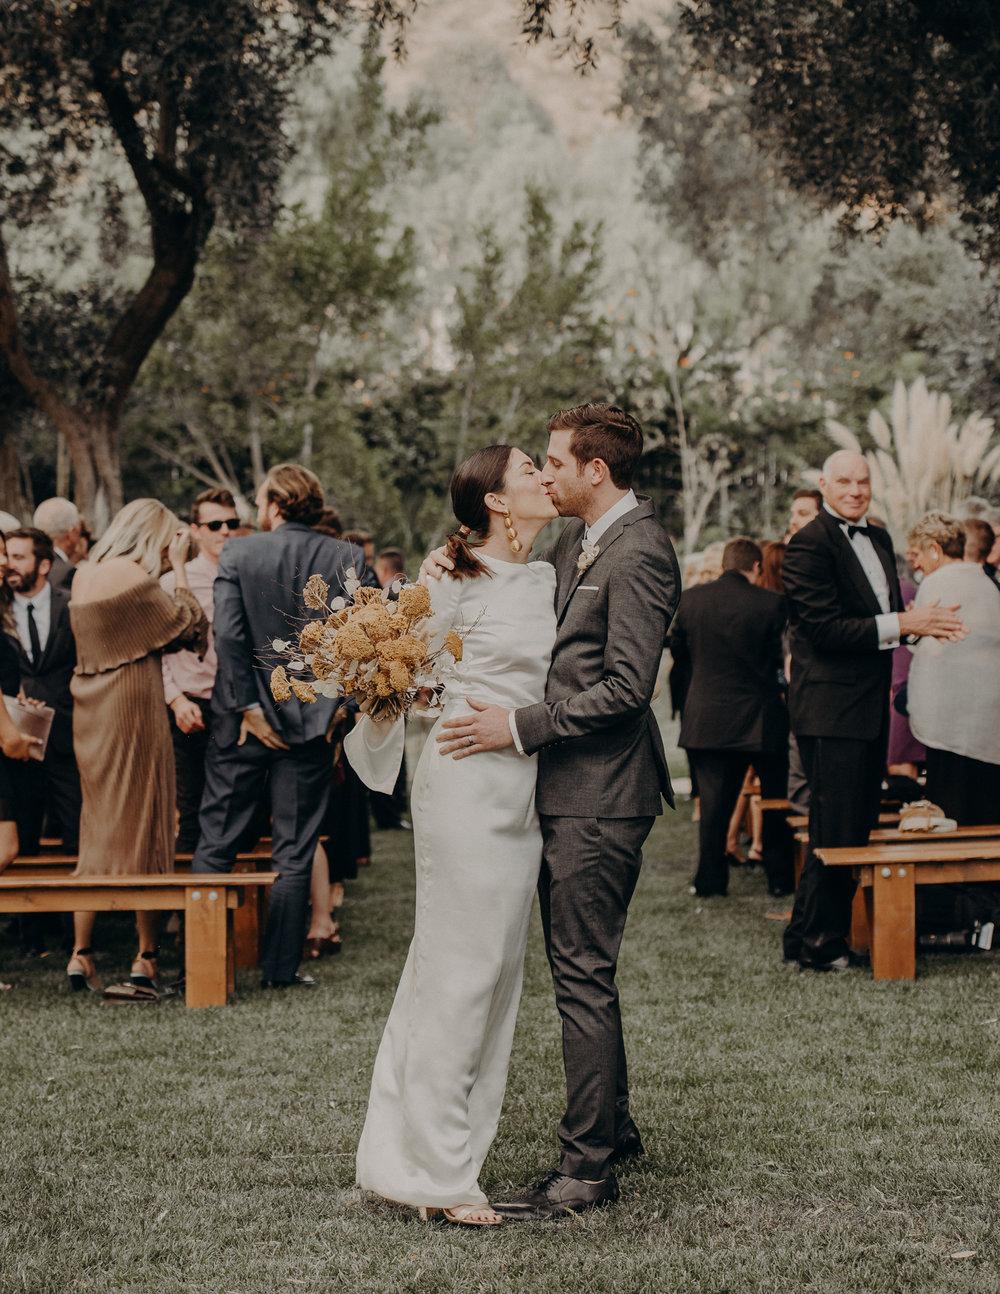 Hummingbird+Nest+Ranch+Wedding+-+Wedding+Photographer+in+Los+Angeles+-+IsaiahAndTaylor.com-052.jpg